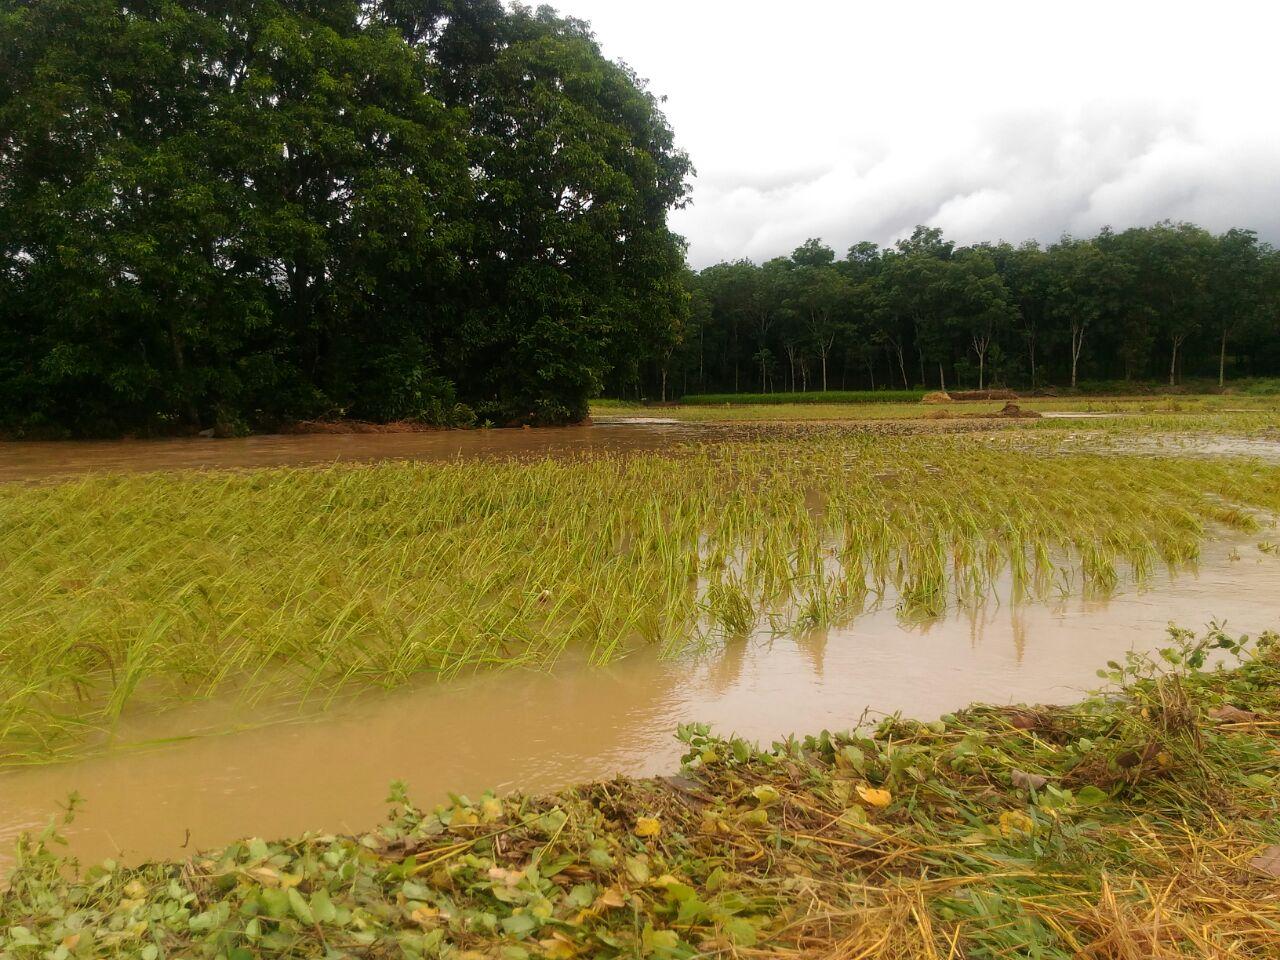 Puluhan Hektare Tanaman Padi dan Kolam Ikan di Way TubaTerendam Banjir